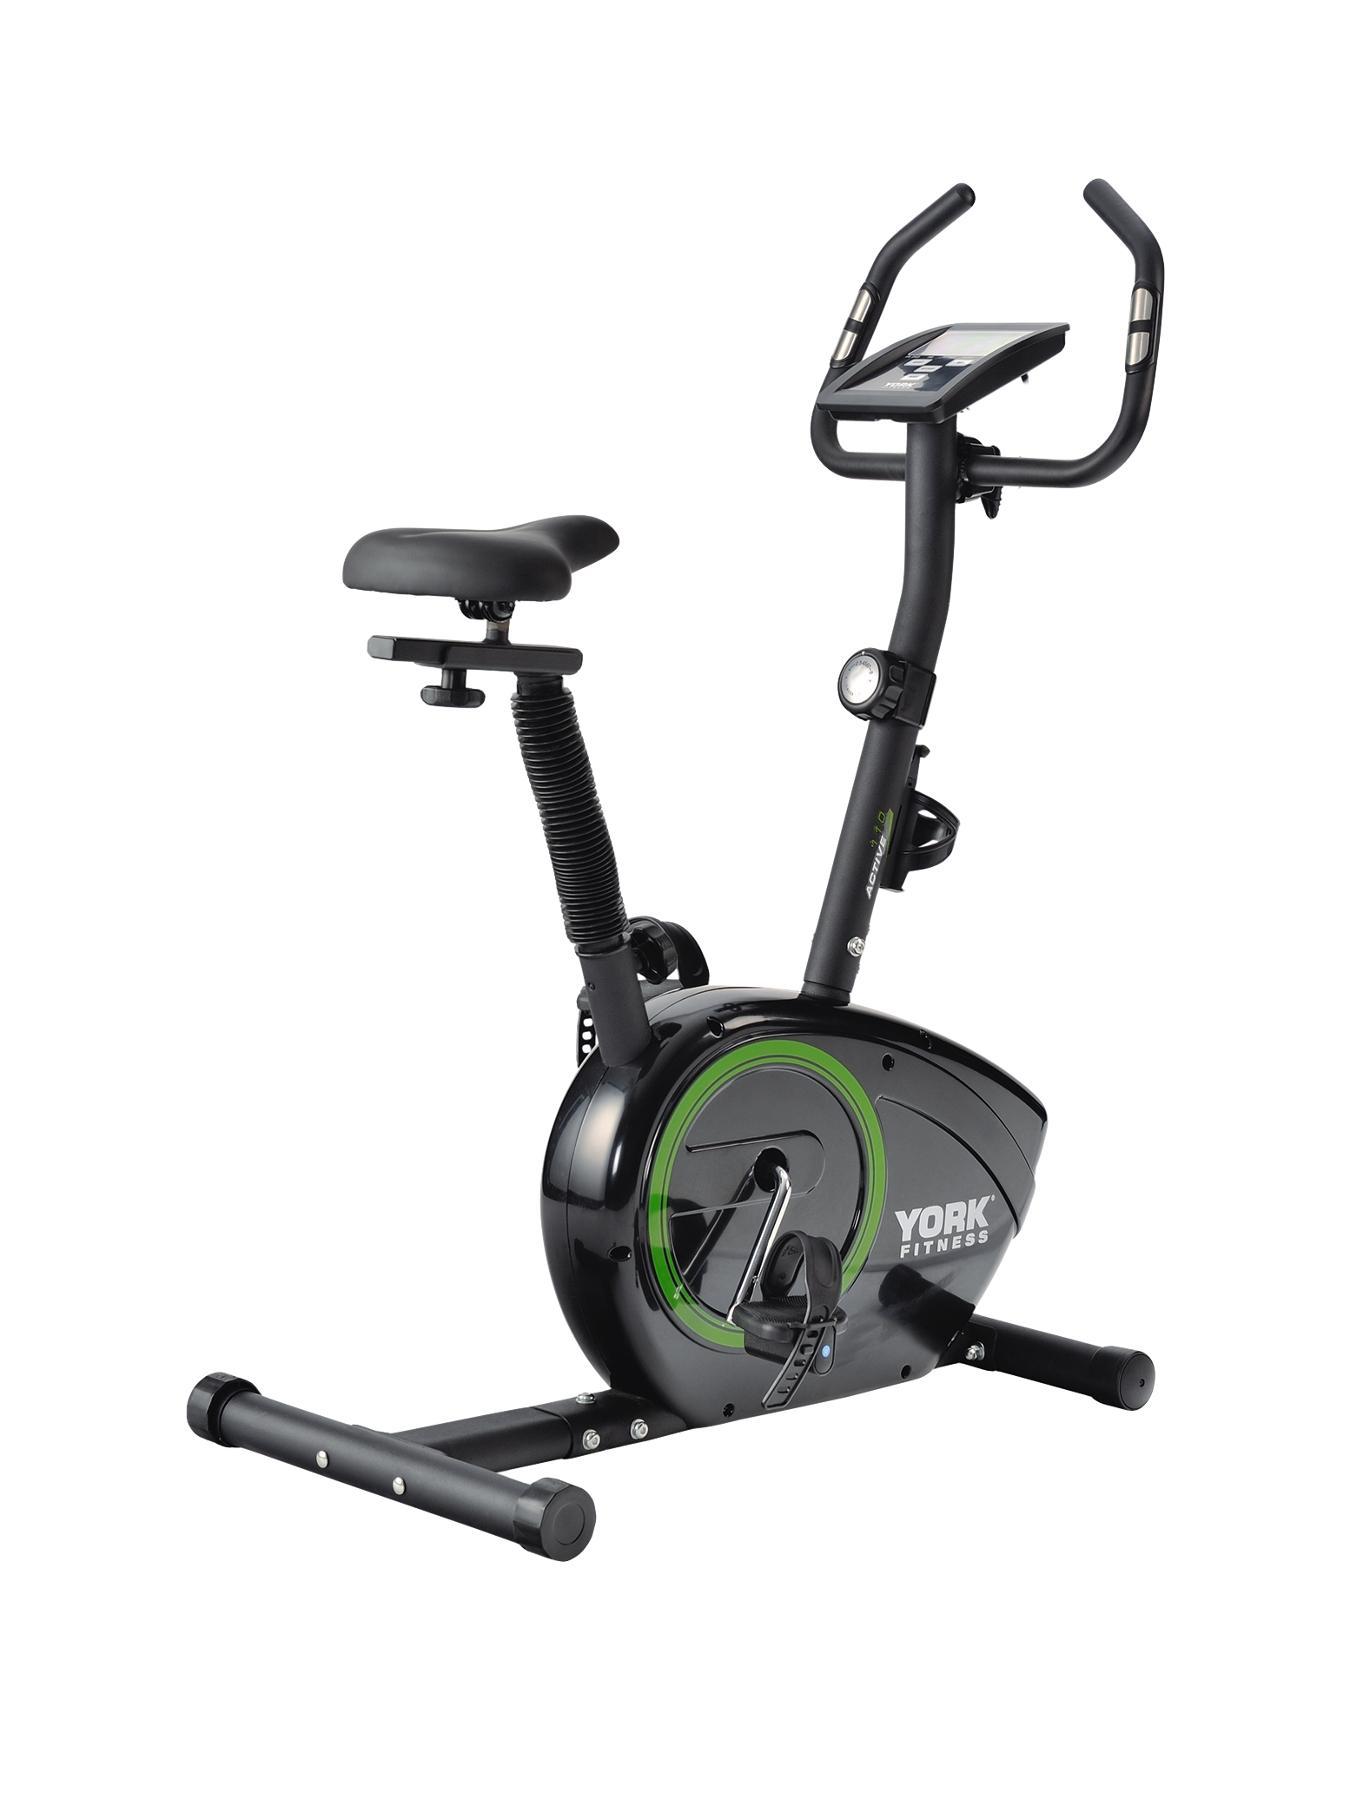 110 Exercise Bike